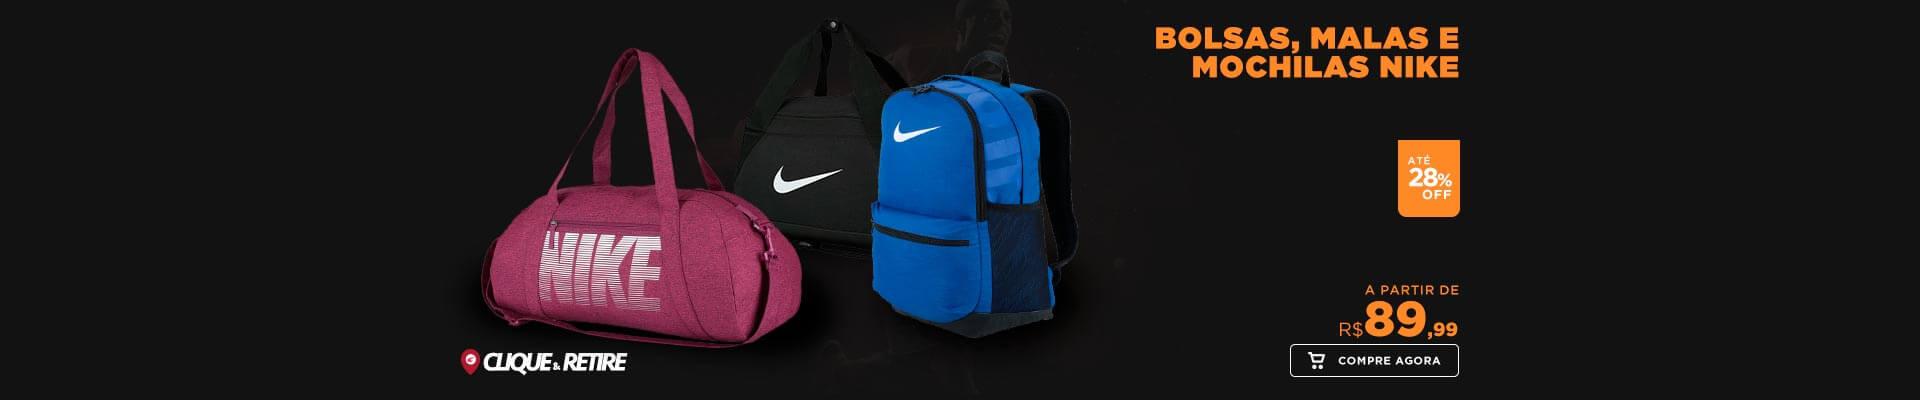 Bolsas, Malas e Mochilas Nike